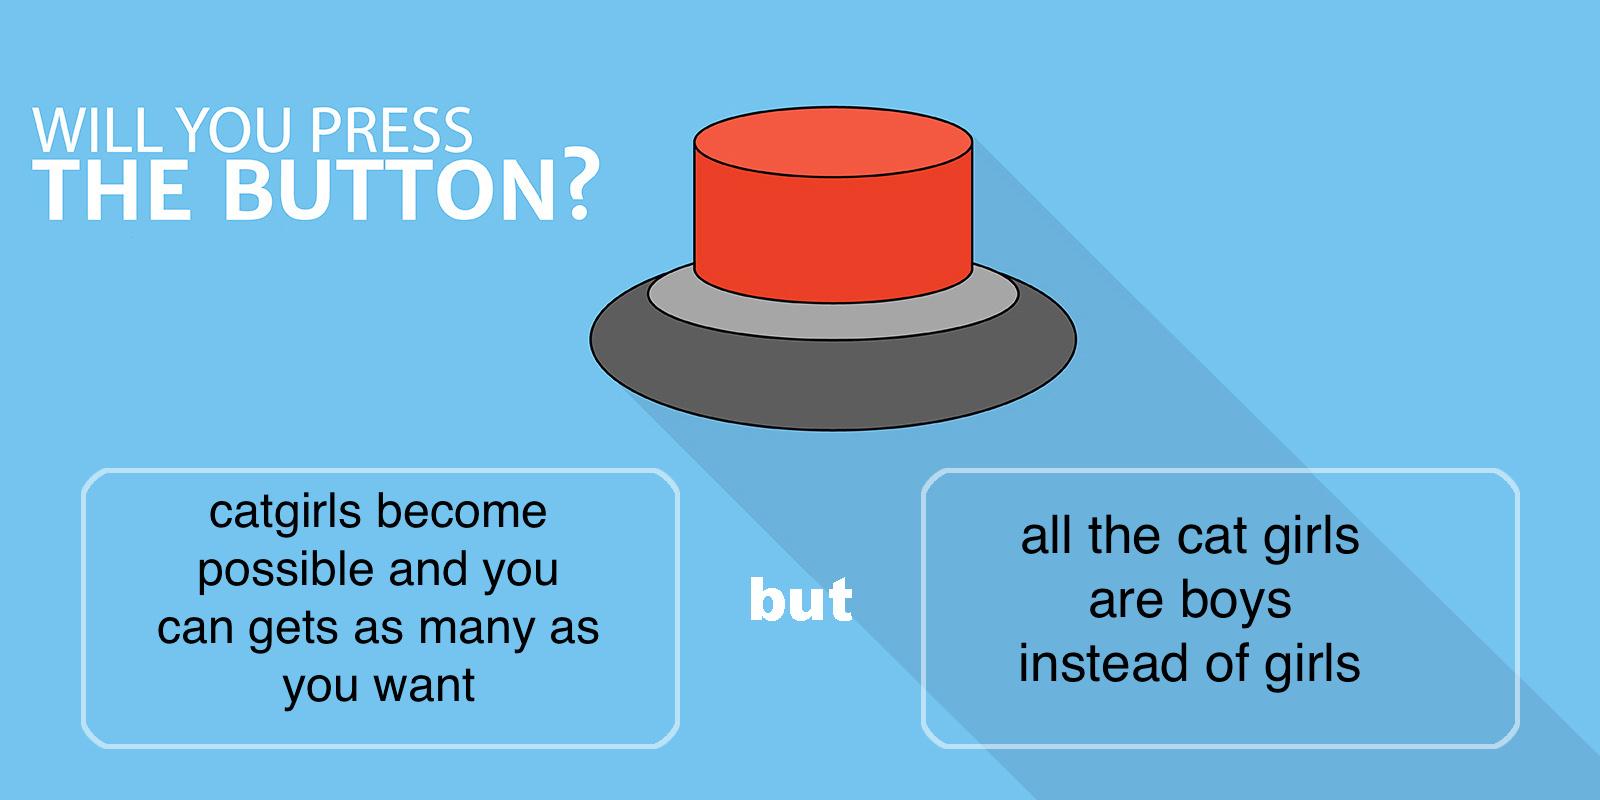 will you press the button - meme